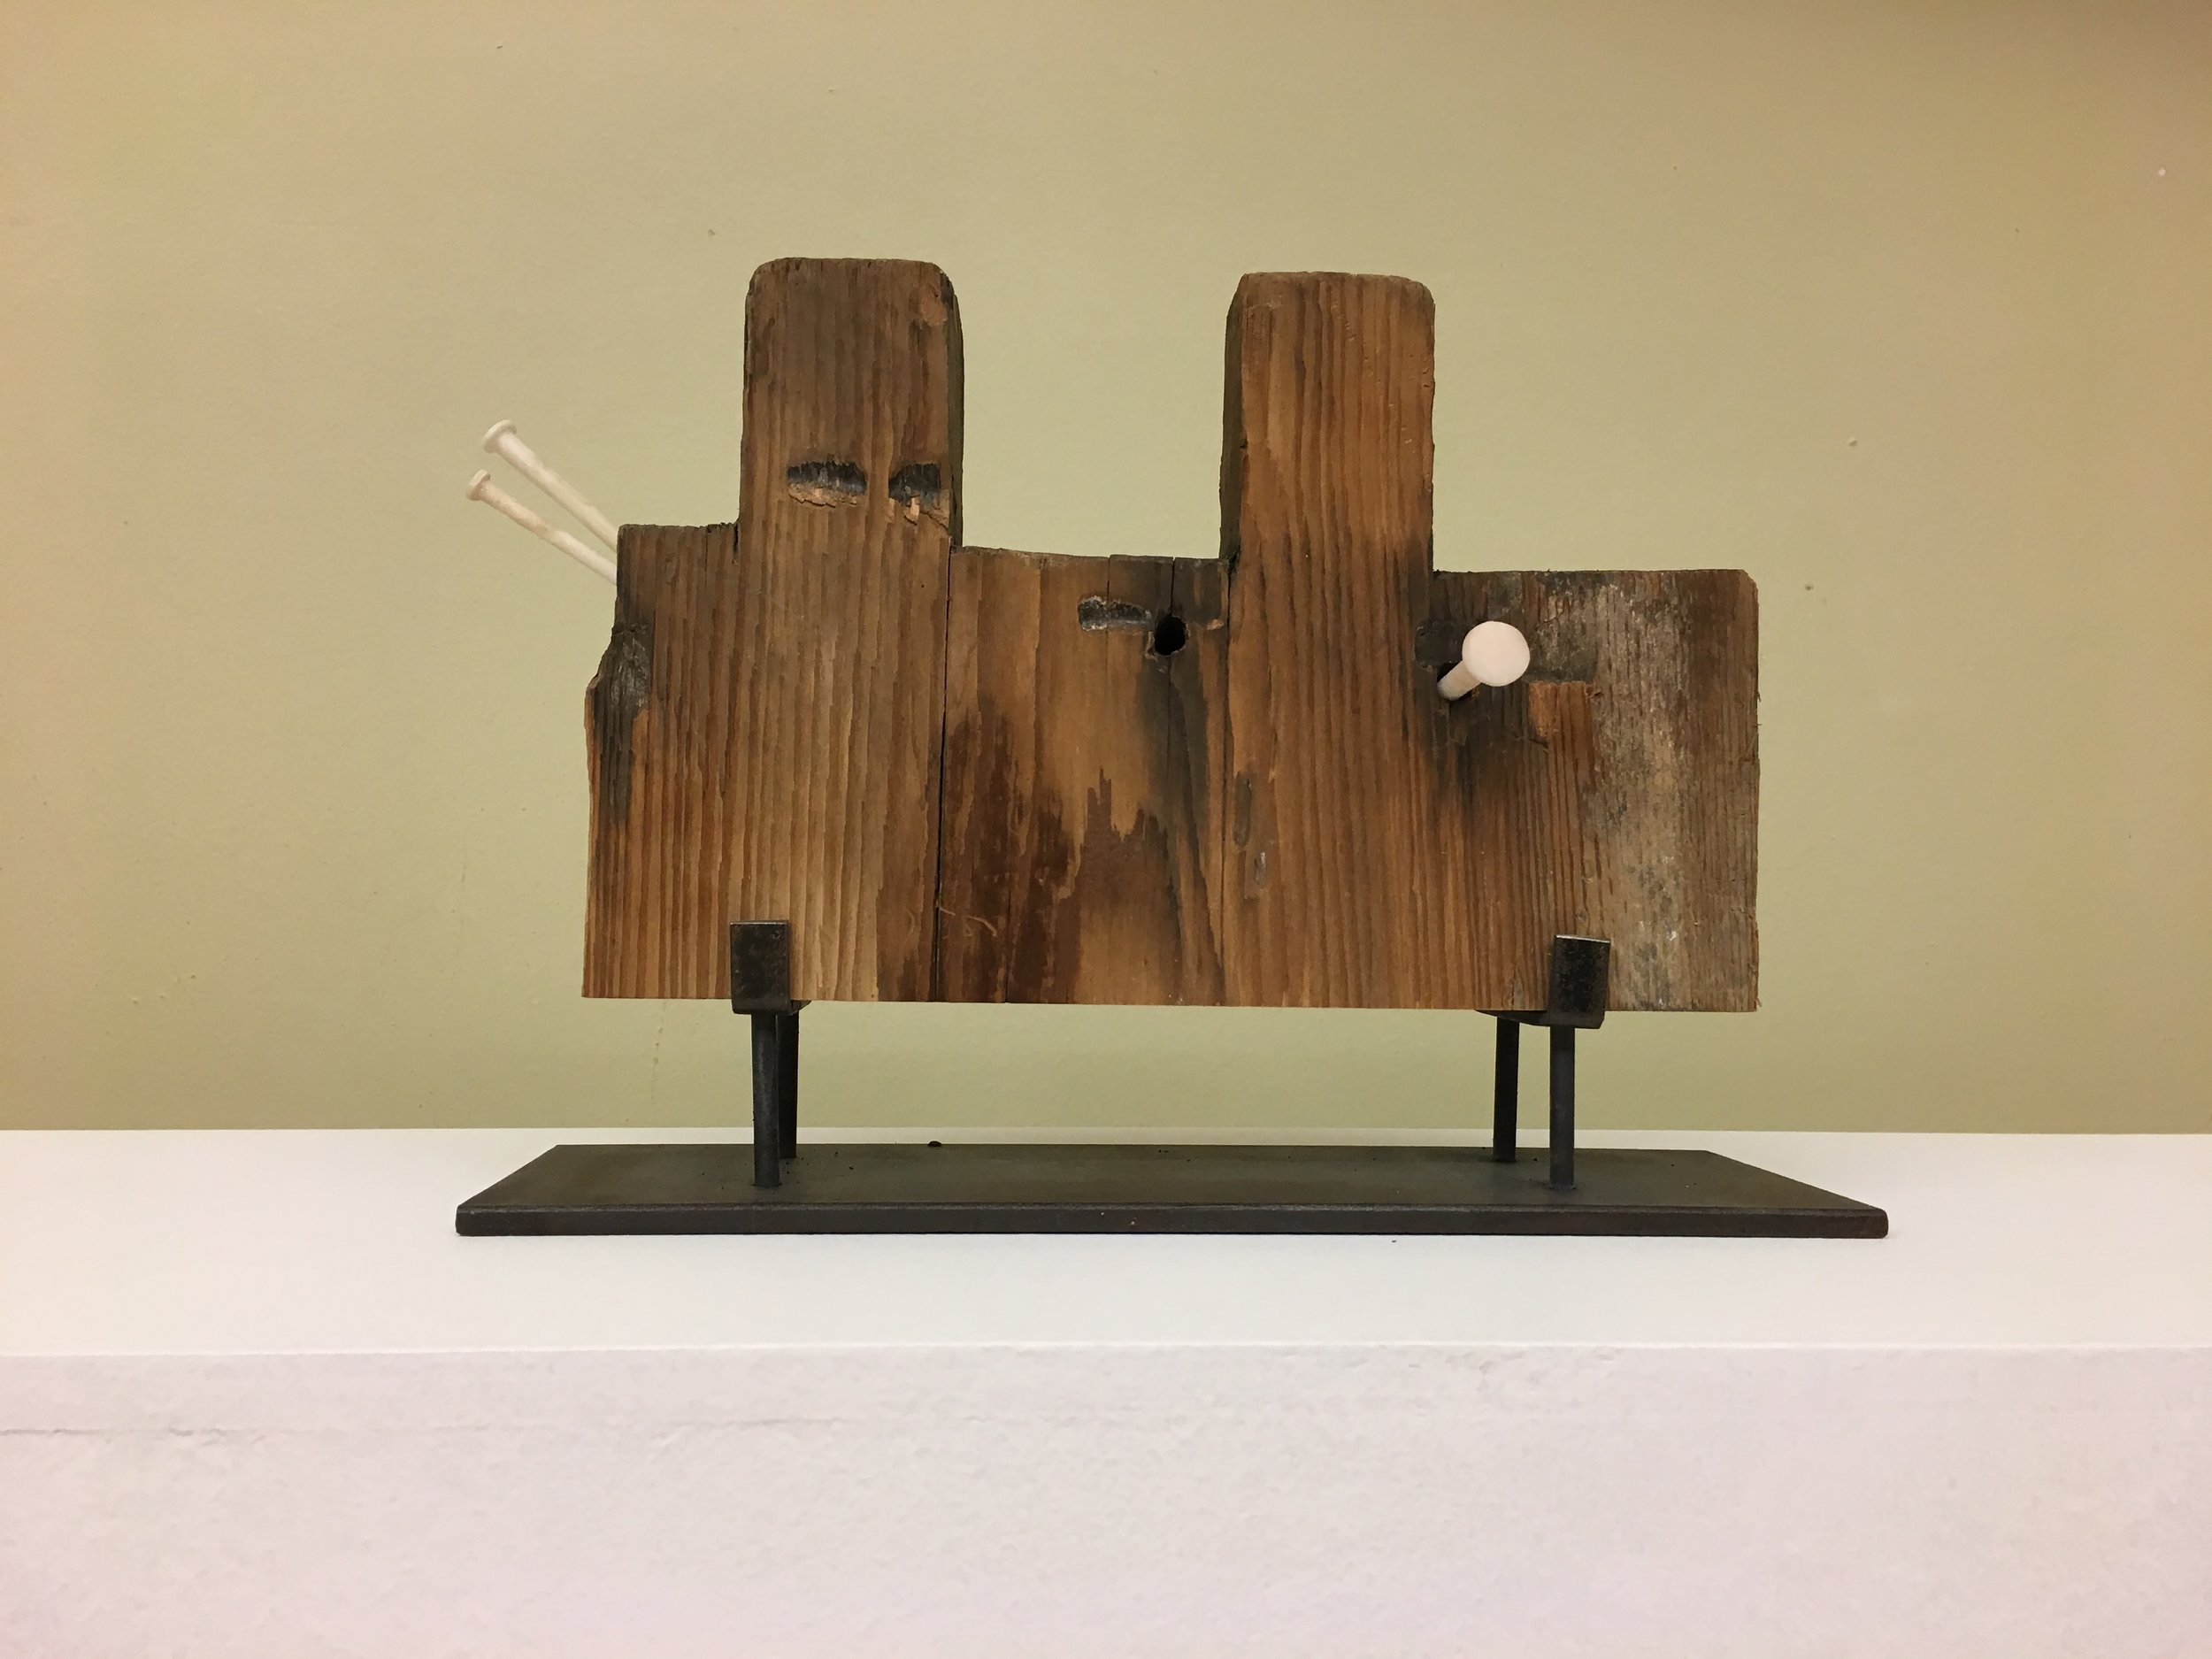 David Lusk Gallery, Greely Myatt,  Notched , 2019, Alabaster, found wood, steel, 8 x16 x 4in.